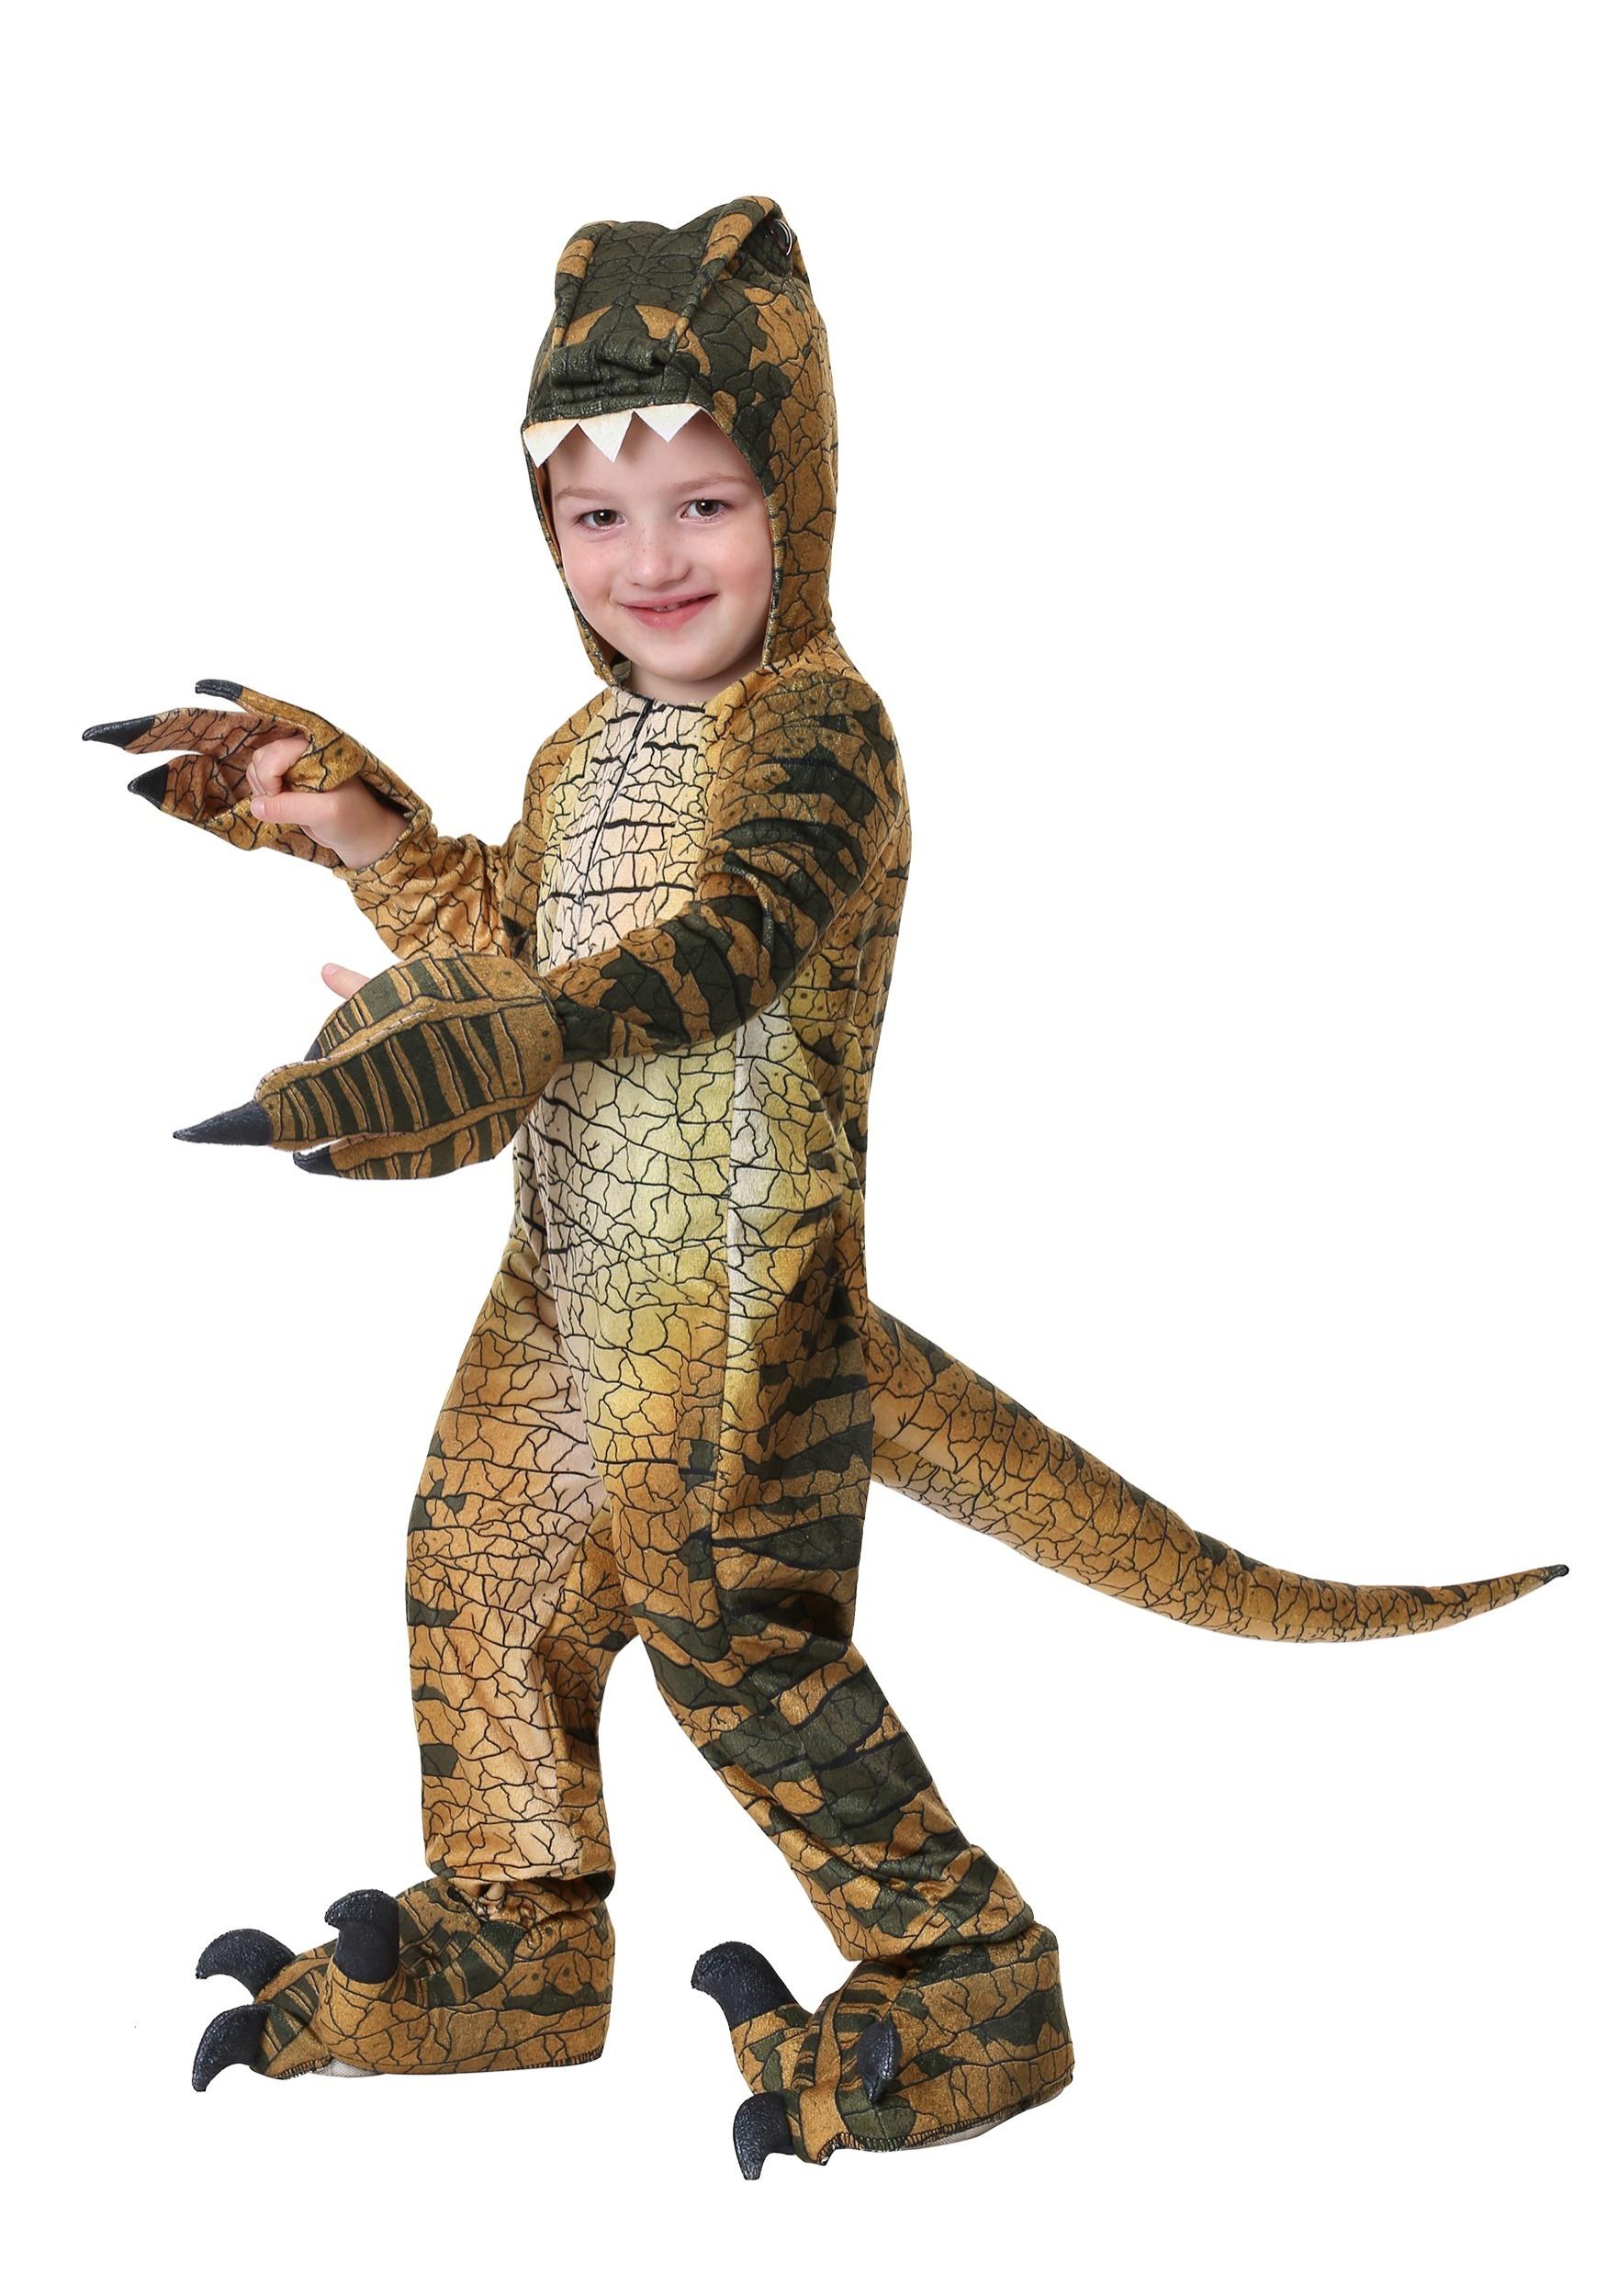 Velociraptor Costume for a Toddler